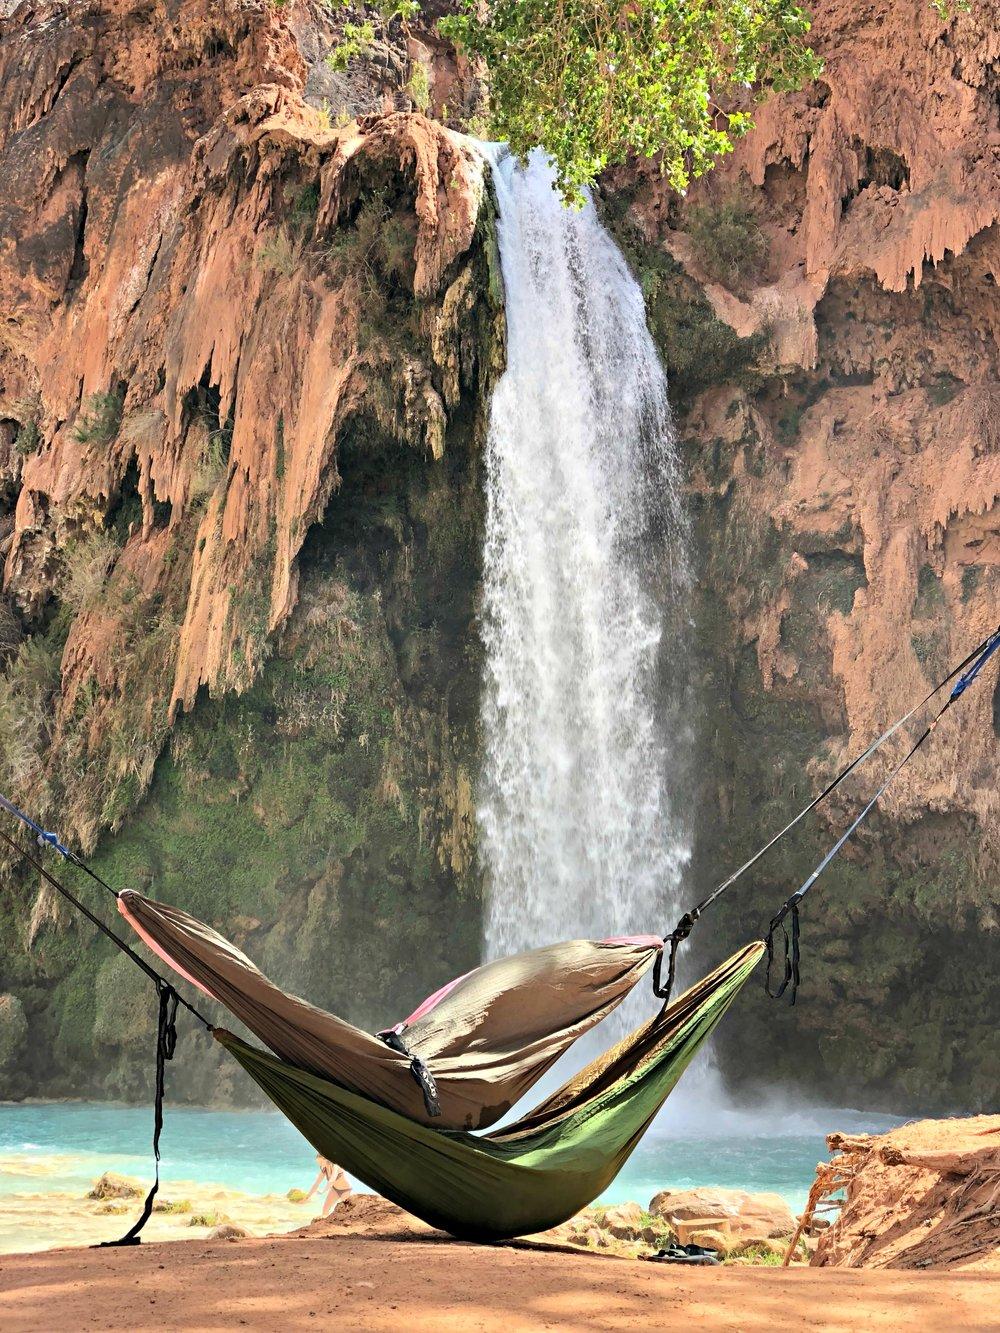 hobo hammocks havasu falls